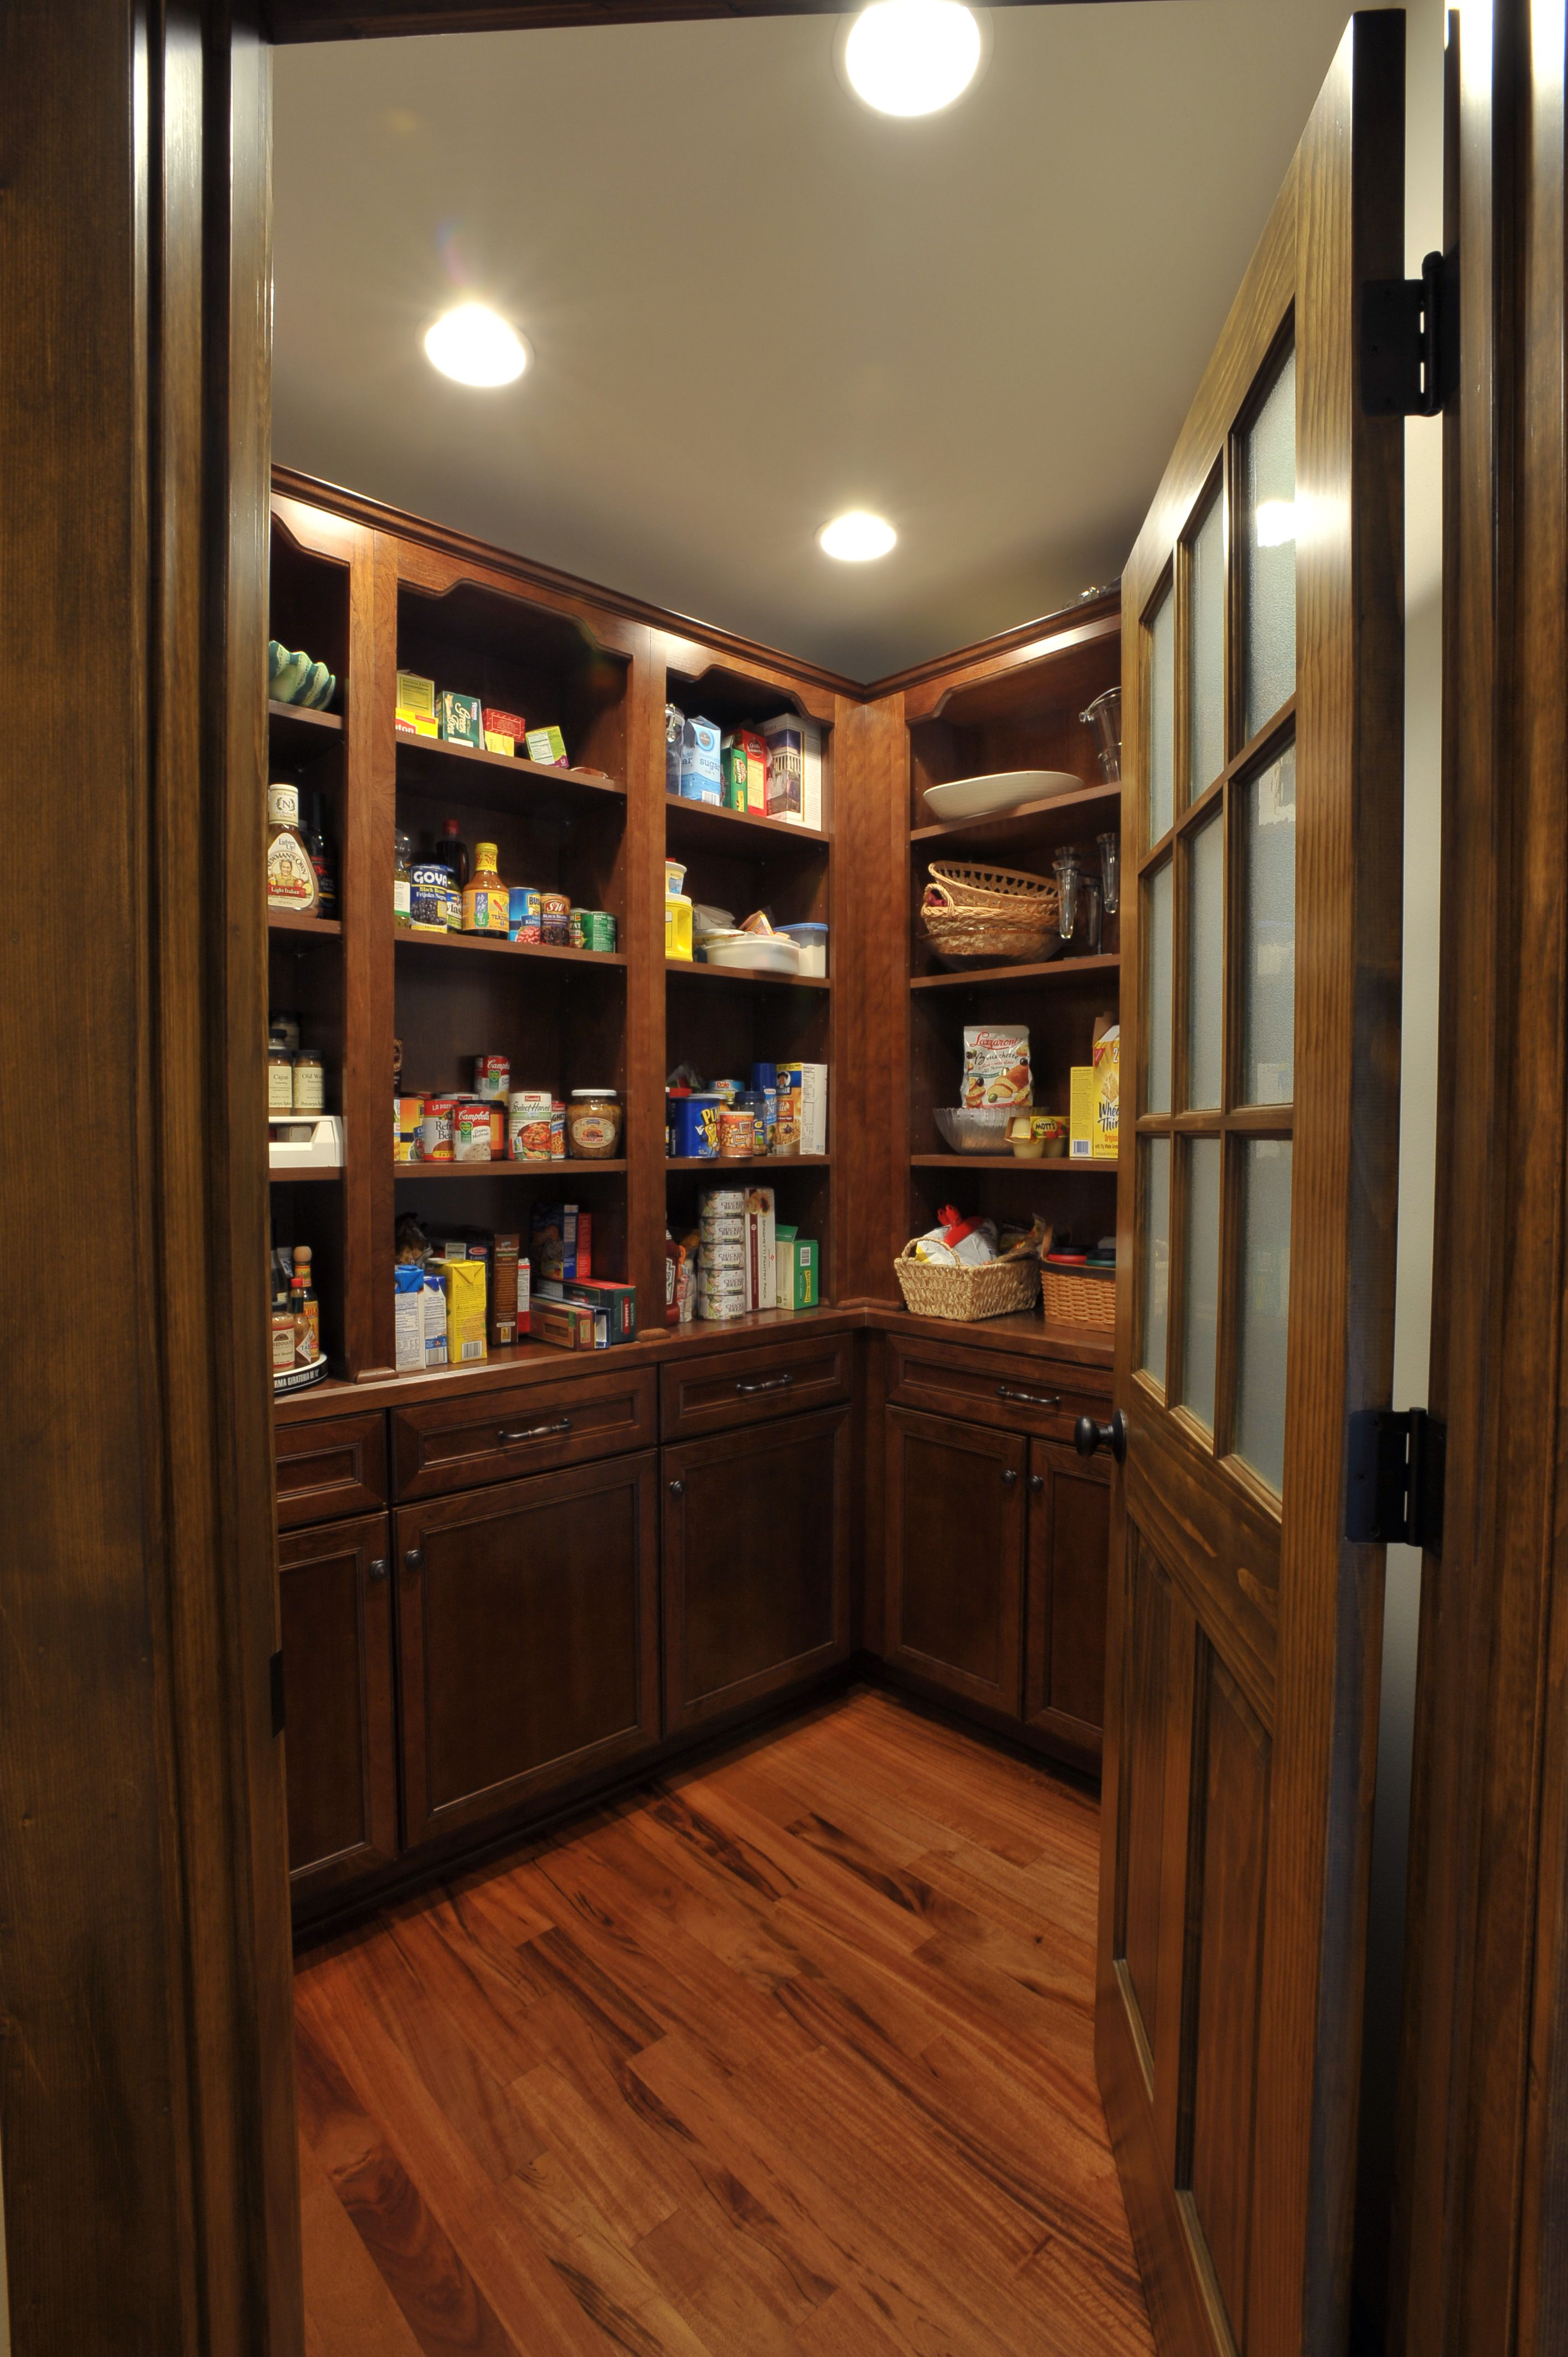 tudor kitchen remodel pacific fan auwatosa s j janis company 203